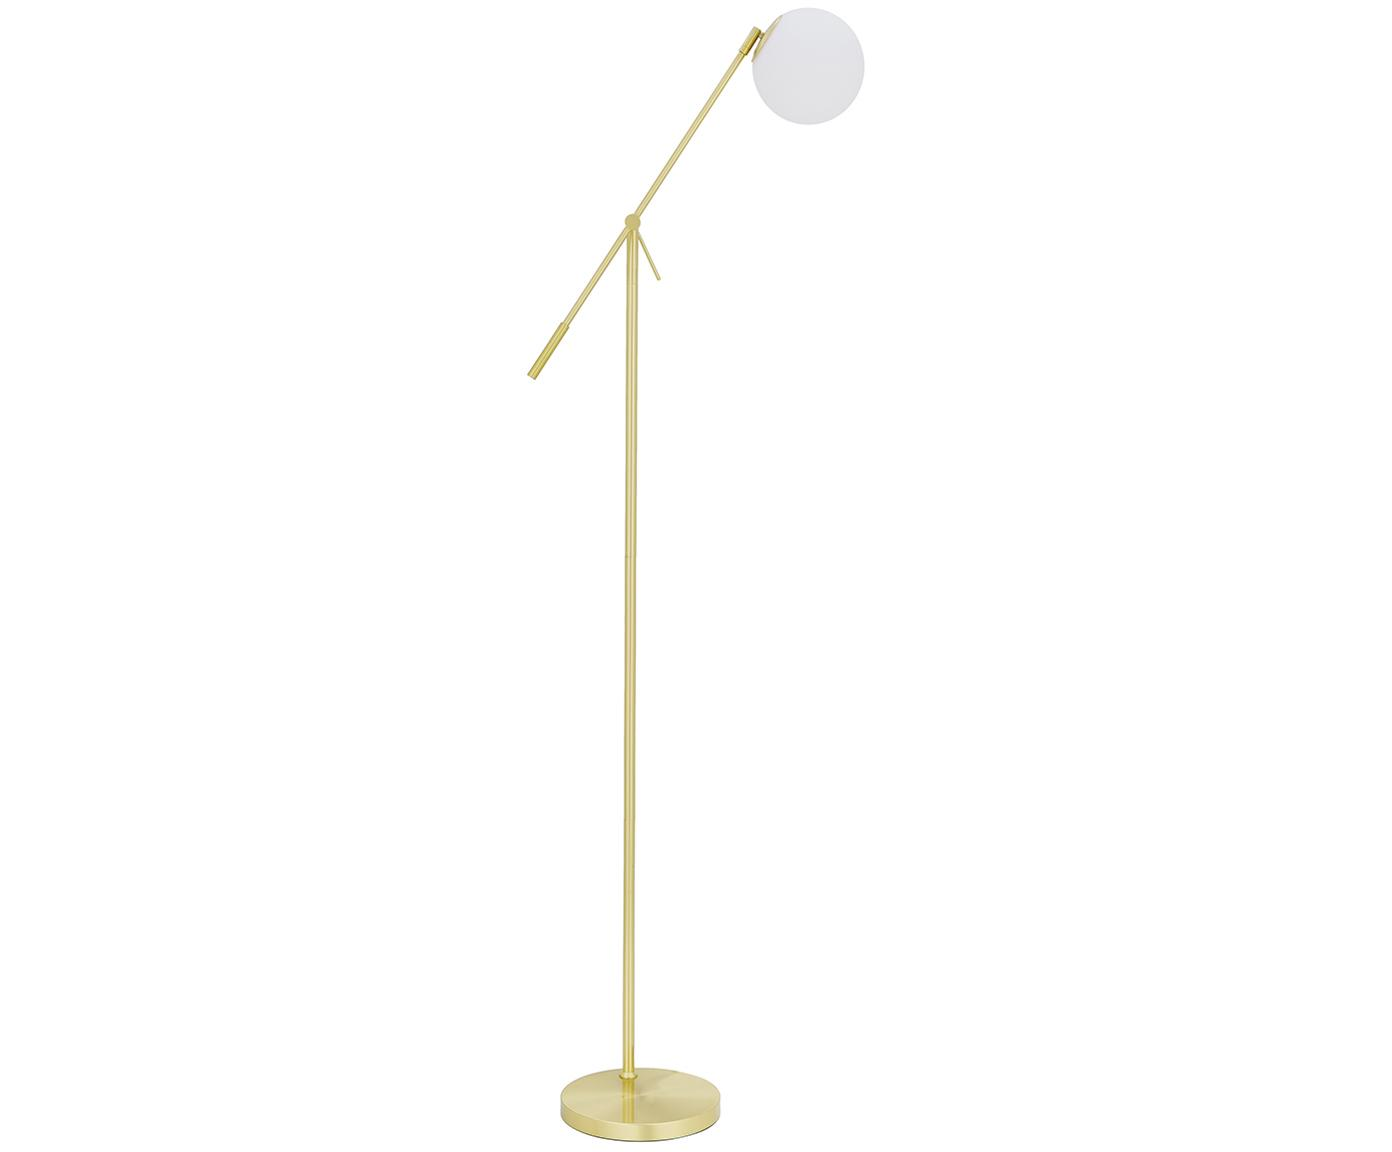 Vloerlamp Moon, Lampenkap: glas, Baldakijn en fitting: geborsteld messingkleurig. Lampenkap: wit. Snoer: zwart, Ø 17 x H 162 cm